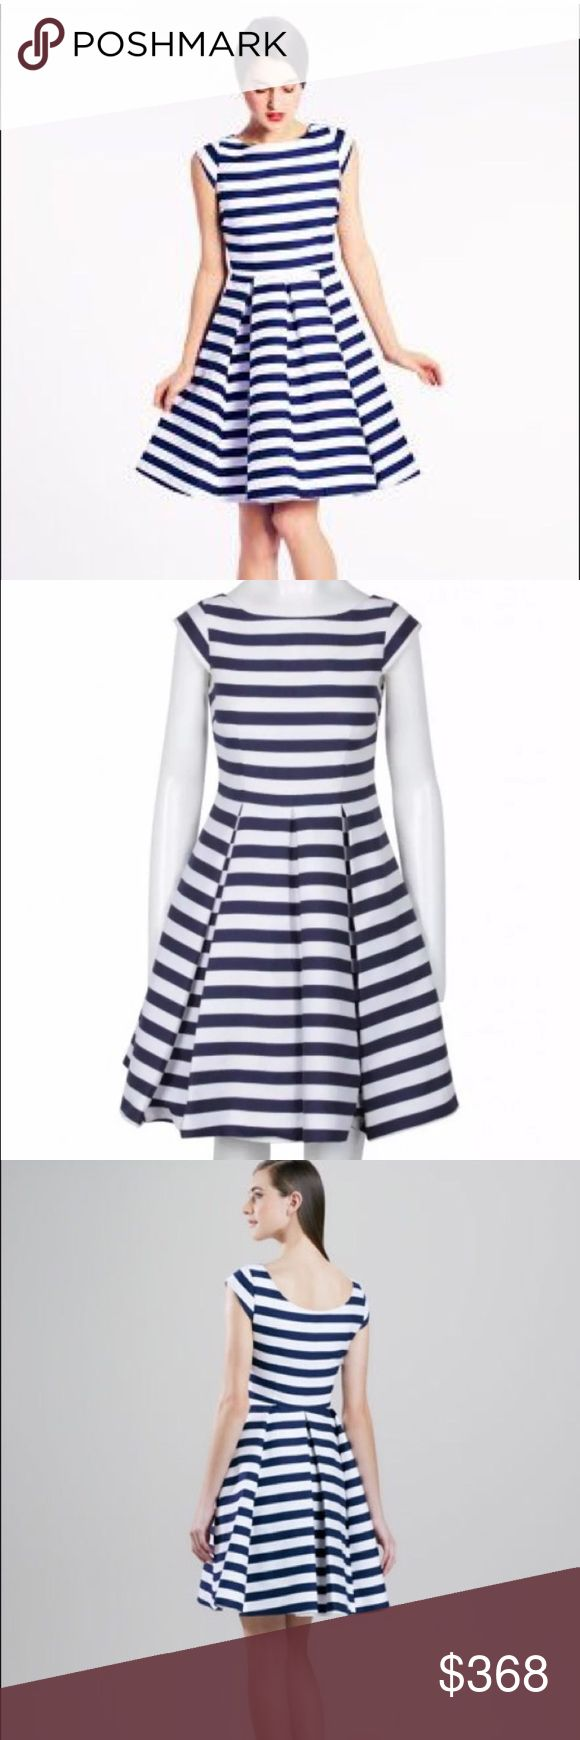 3xHP Kate Spade Mariella Flare Dress Silk Blue 14 Kate Spade New York  Mariella Flare Dress French Blue & White Size 14 USA Cotton & Silk Blend Condition: New with Tags MSRP $488.    🎀HP 10/17🎀 HP 5/2💕 HP 5.6🎉 kate spade Dresses